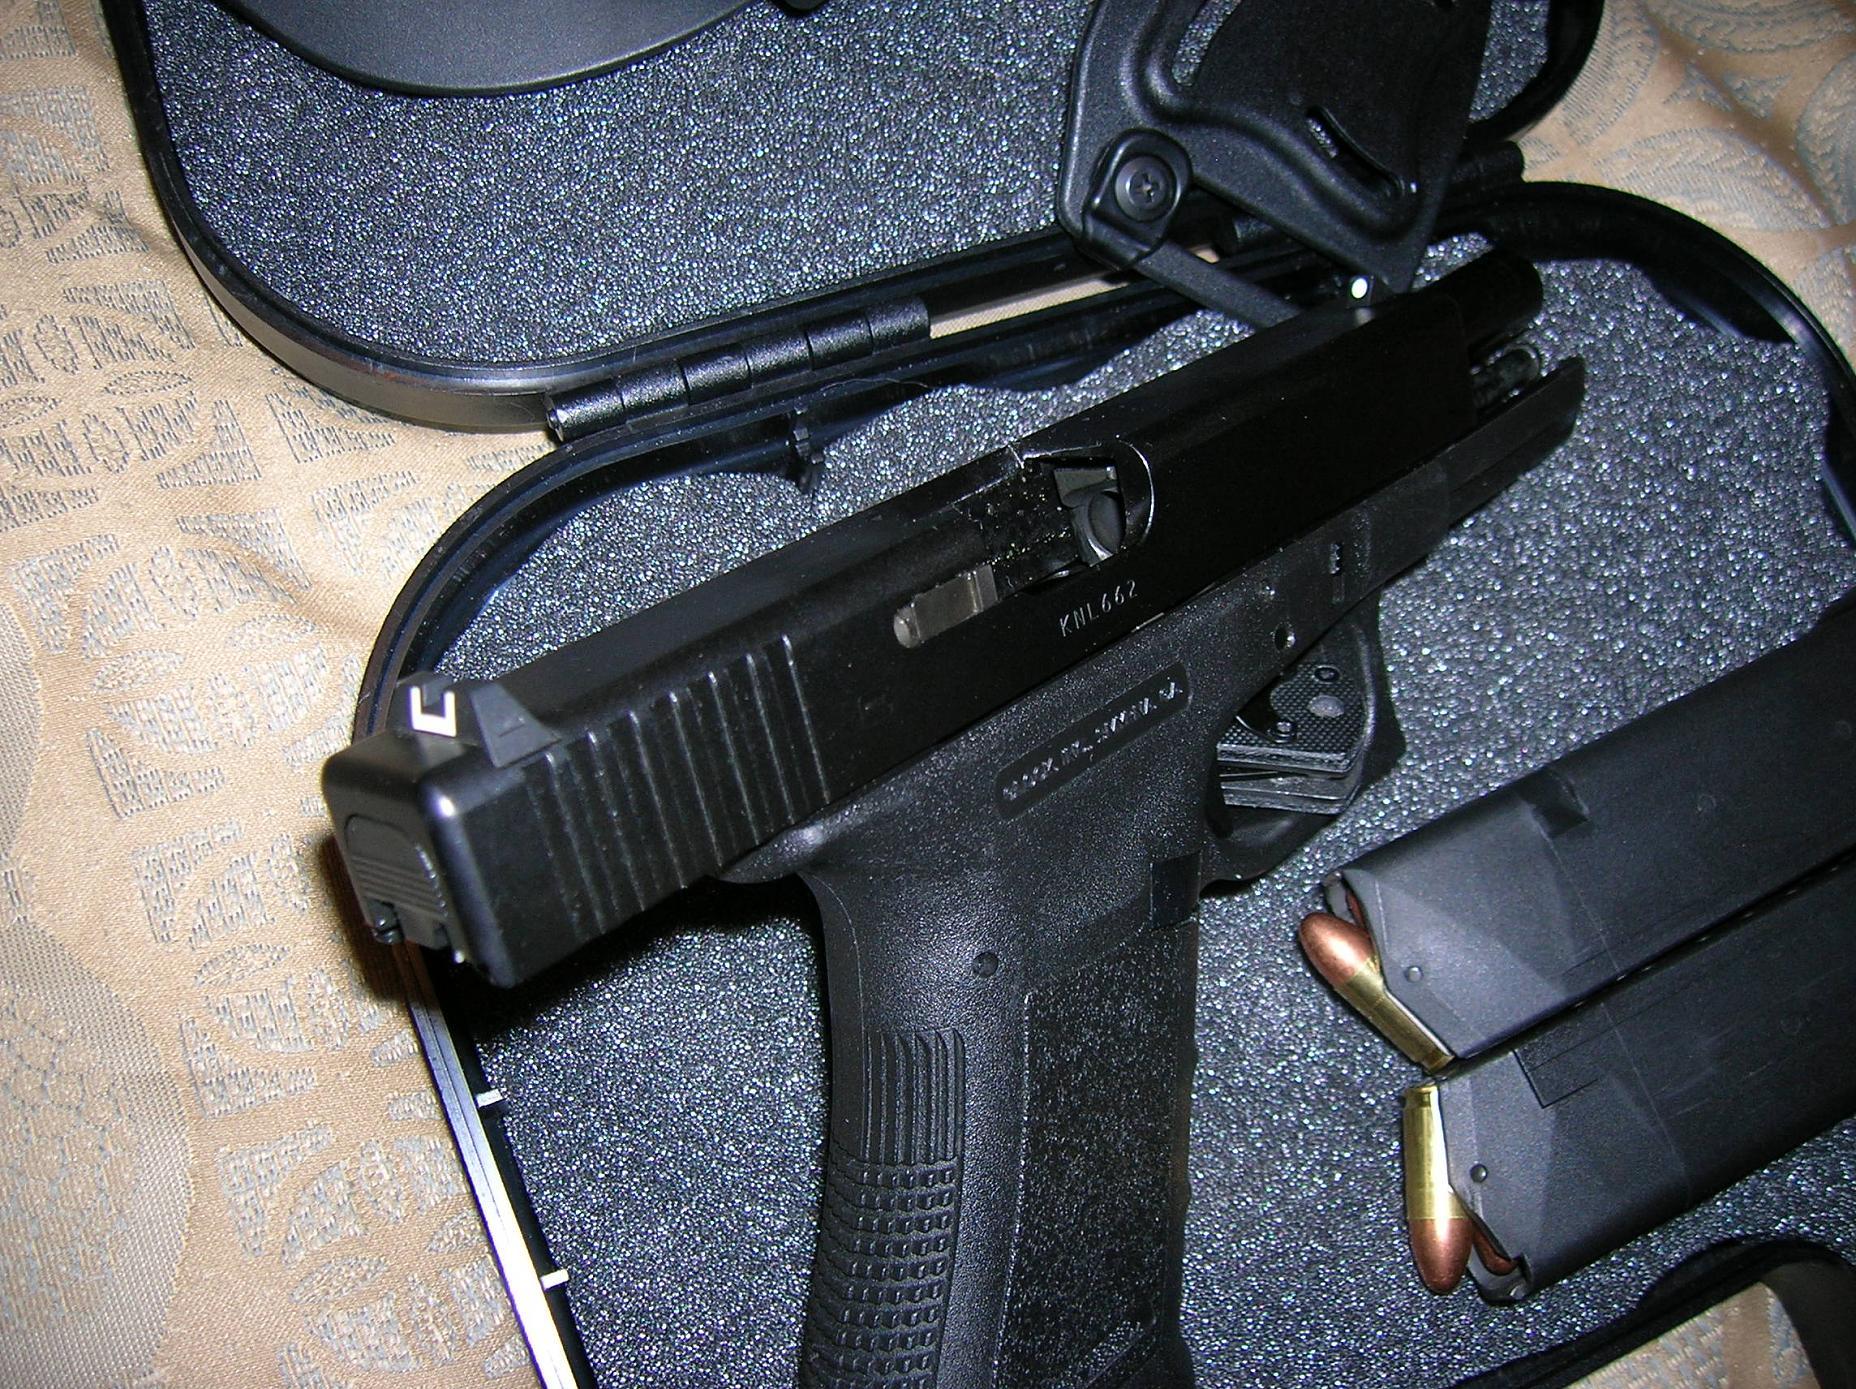 Glock 17 for trade - VA Beach, Richmond, Roanoke-dscn2168.jpg